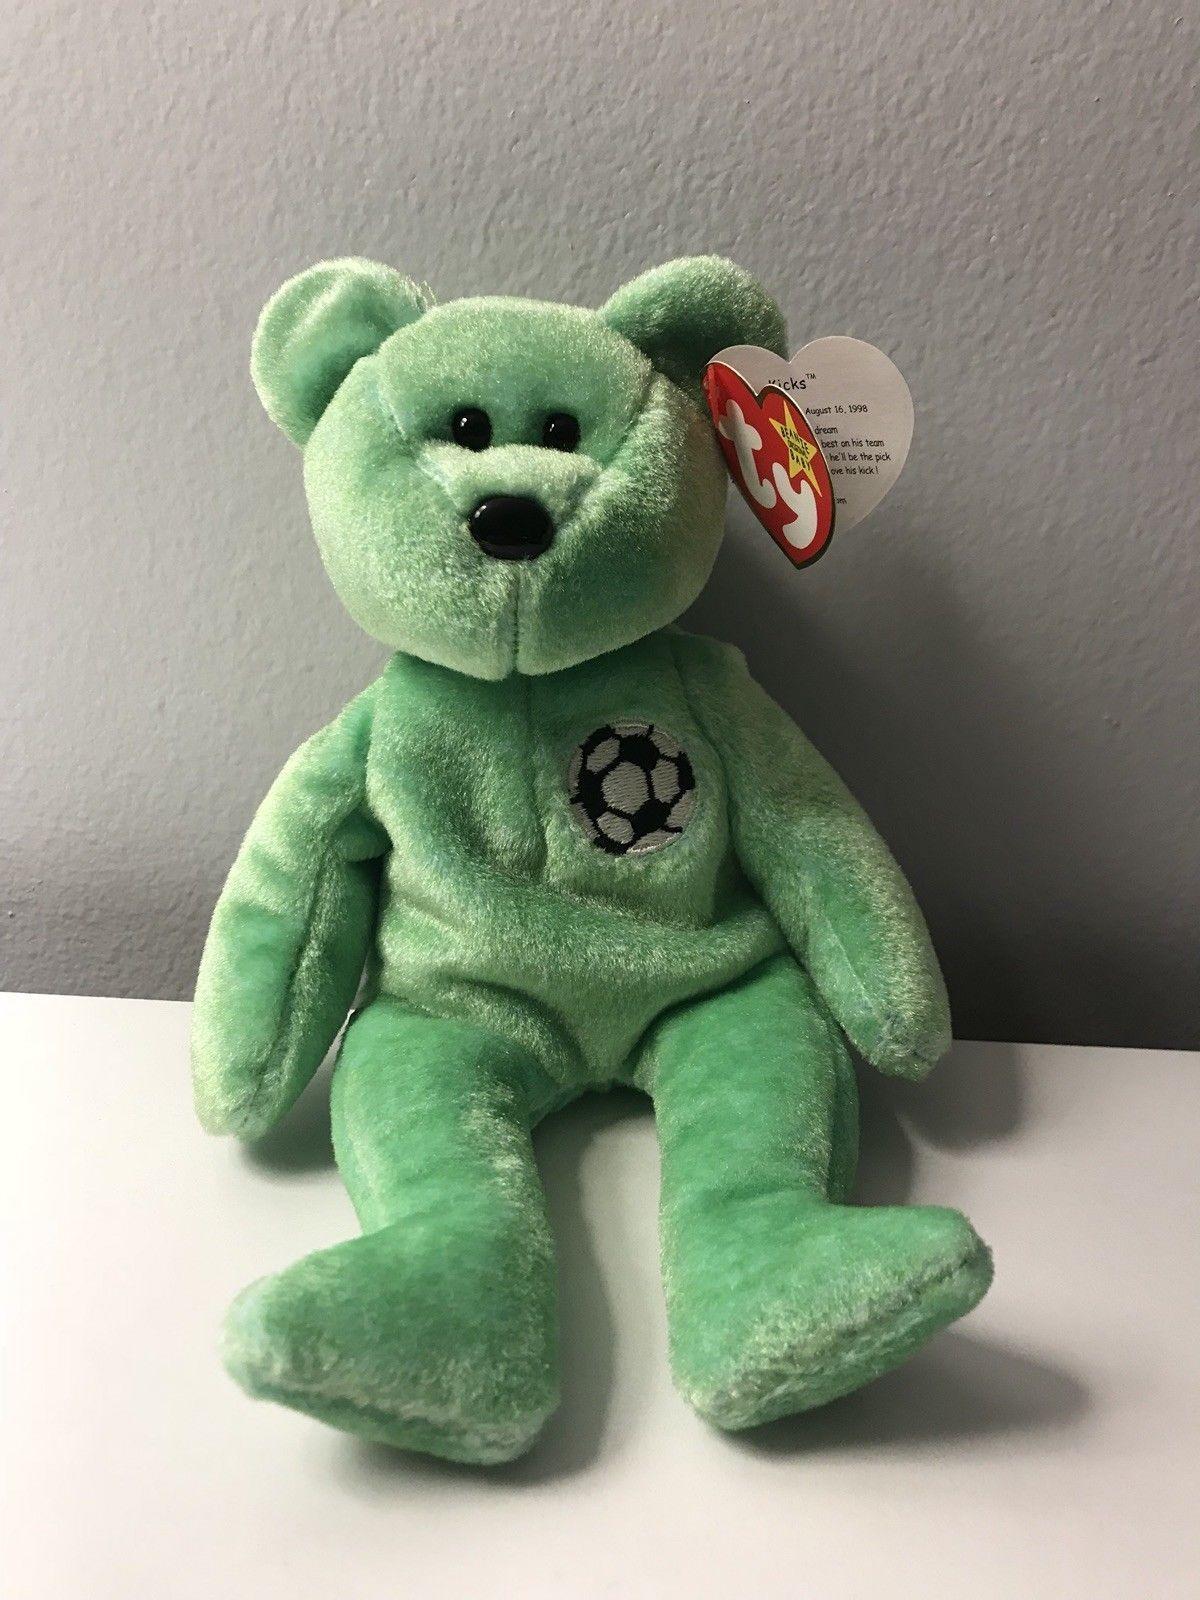 Ty Beanie Babies KICKS The Bear Collectors and 50 similar items. S l1600 72e257016fa8